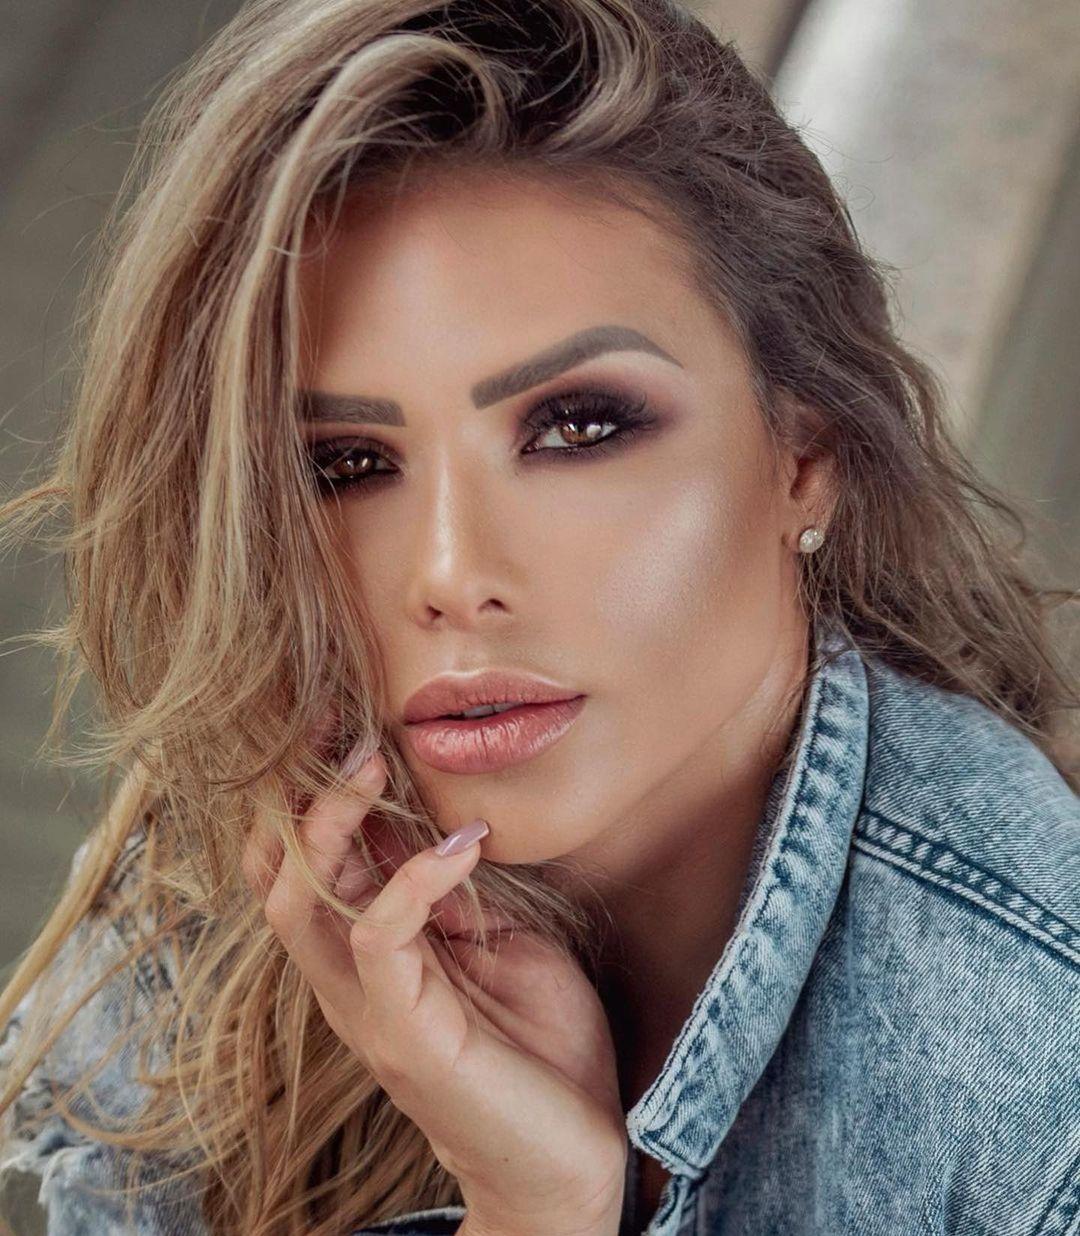 Alessandra-Batista-Wallpapers-Insta-FIt-Bio-6